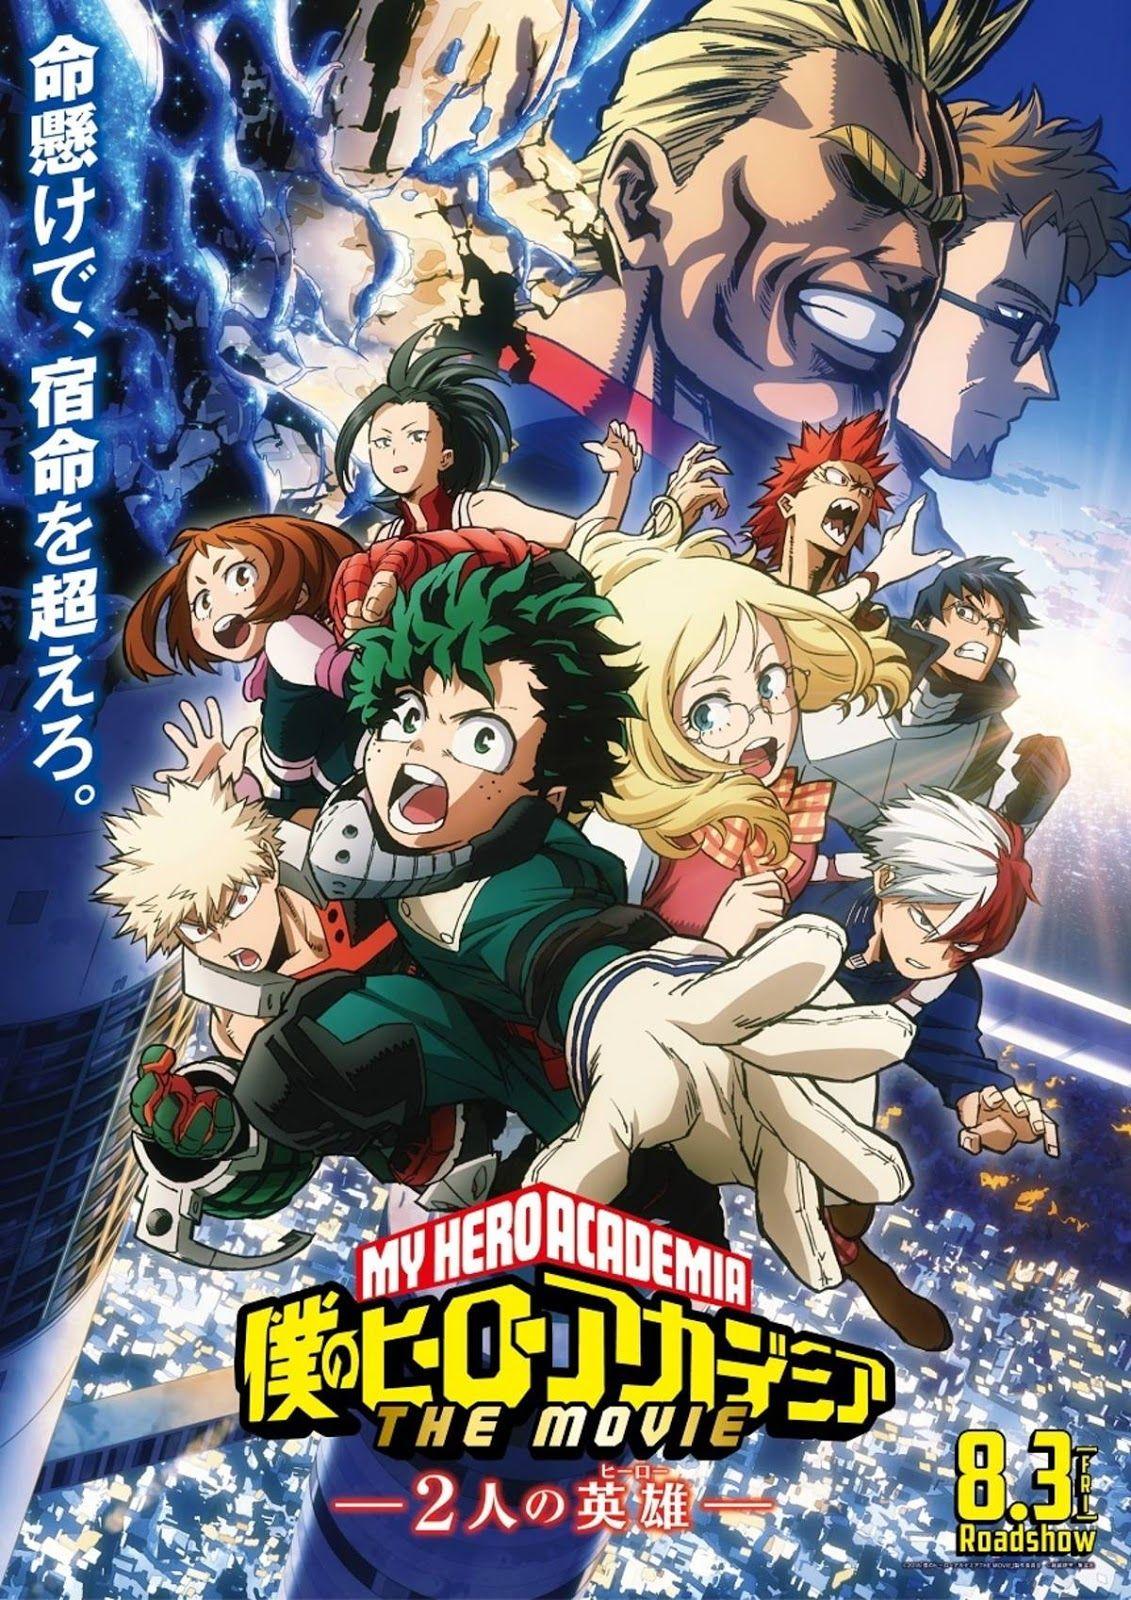 Película de Boku no Hero Academia gana 500 millones de yenes